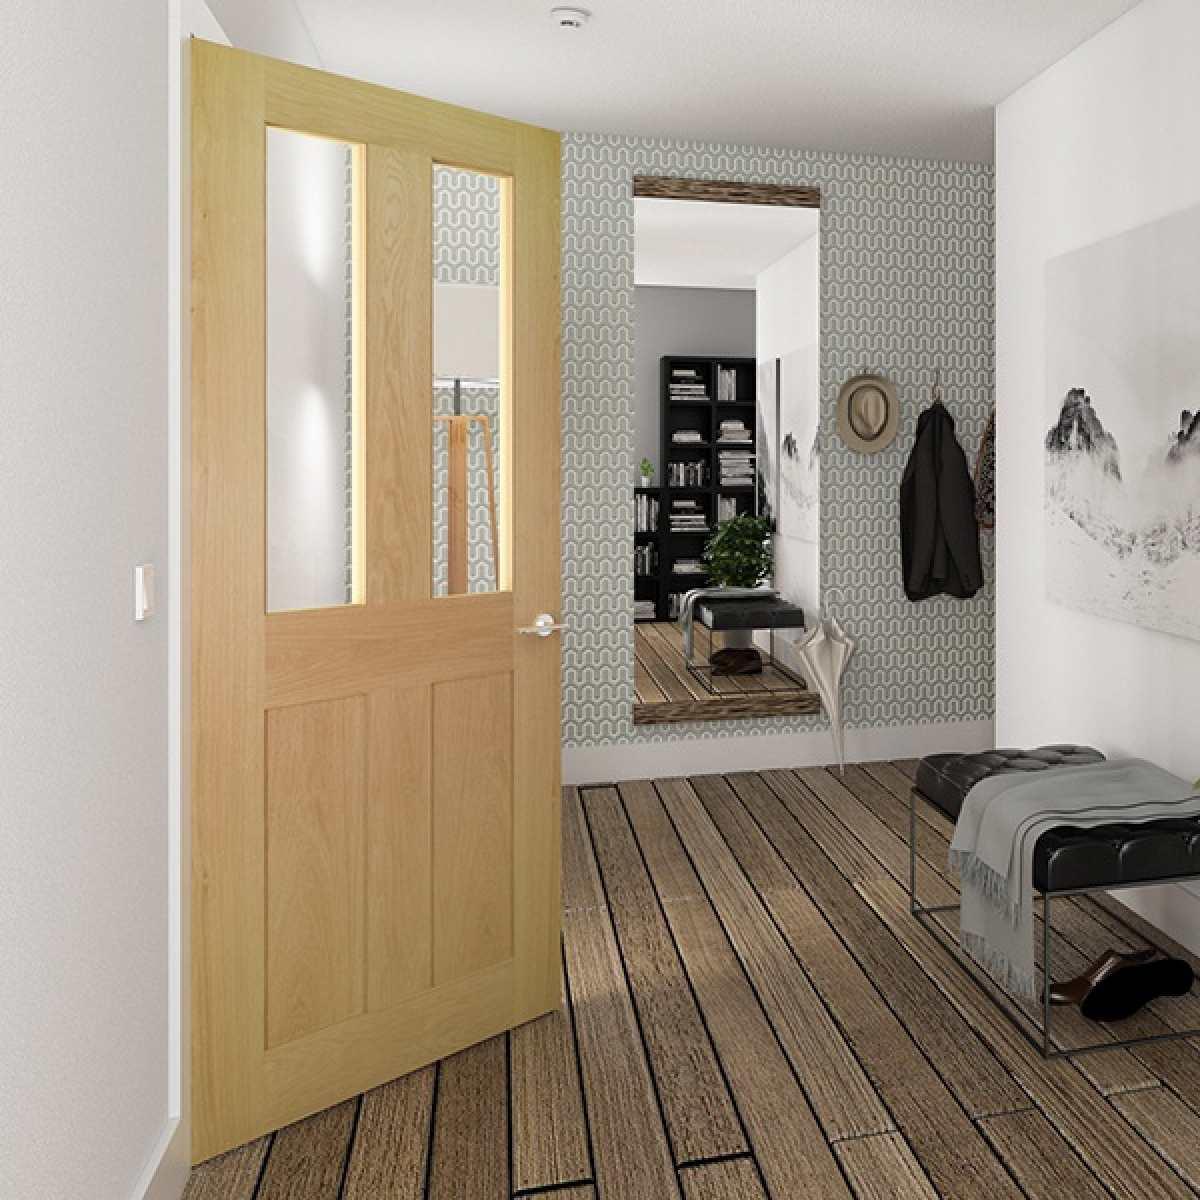 Eton glazed oak 2 lifestyle websters Image by Websters Timber